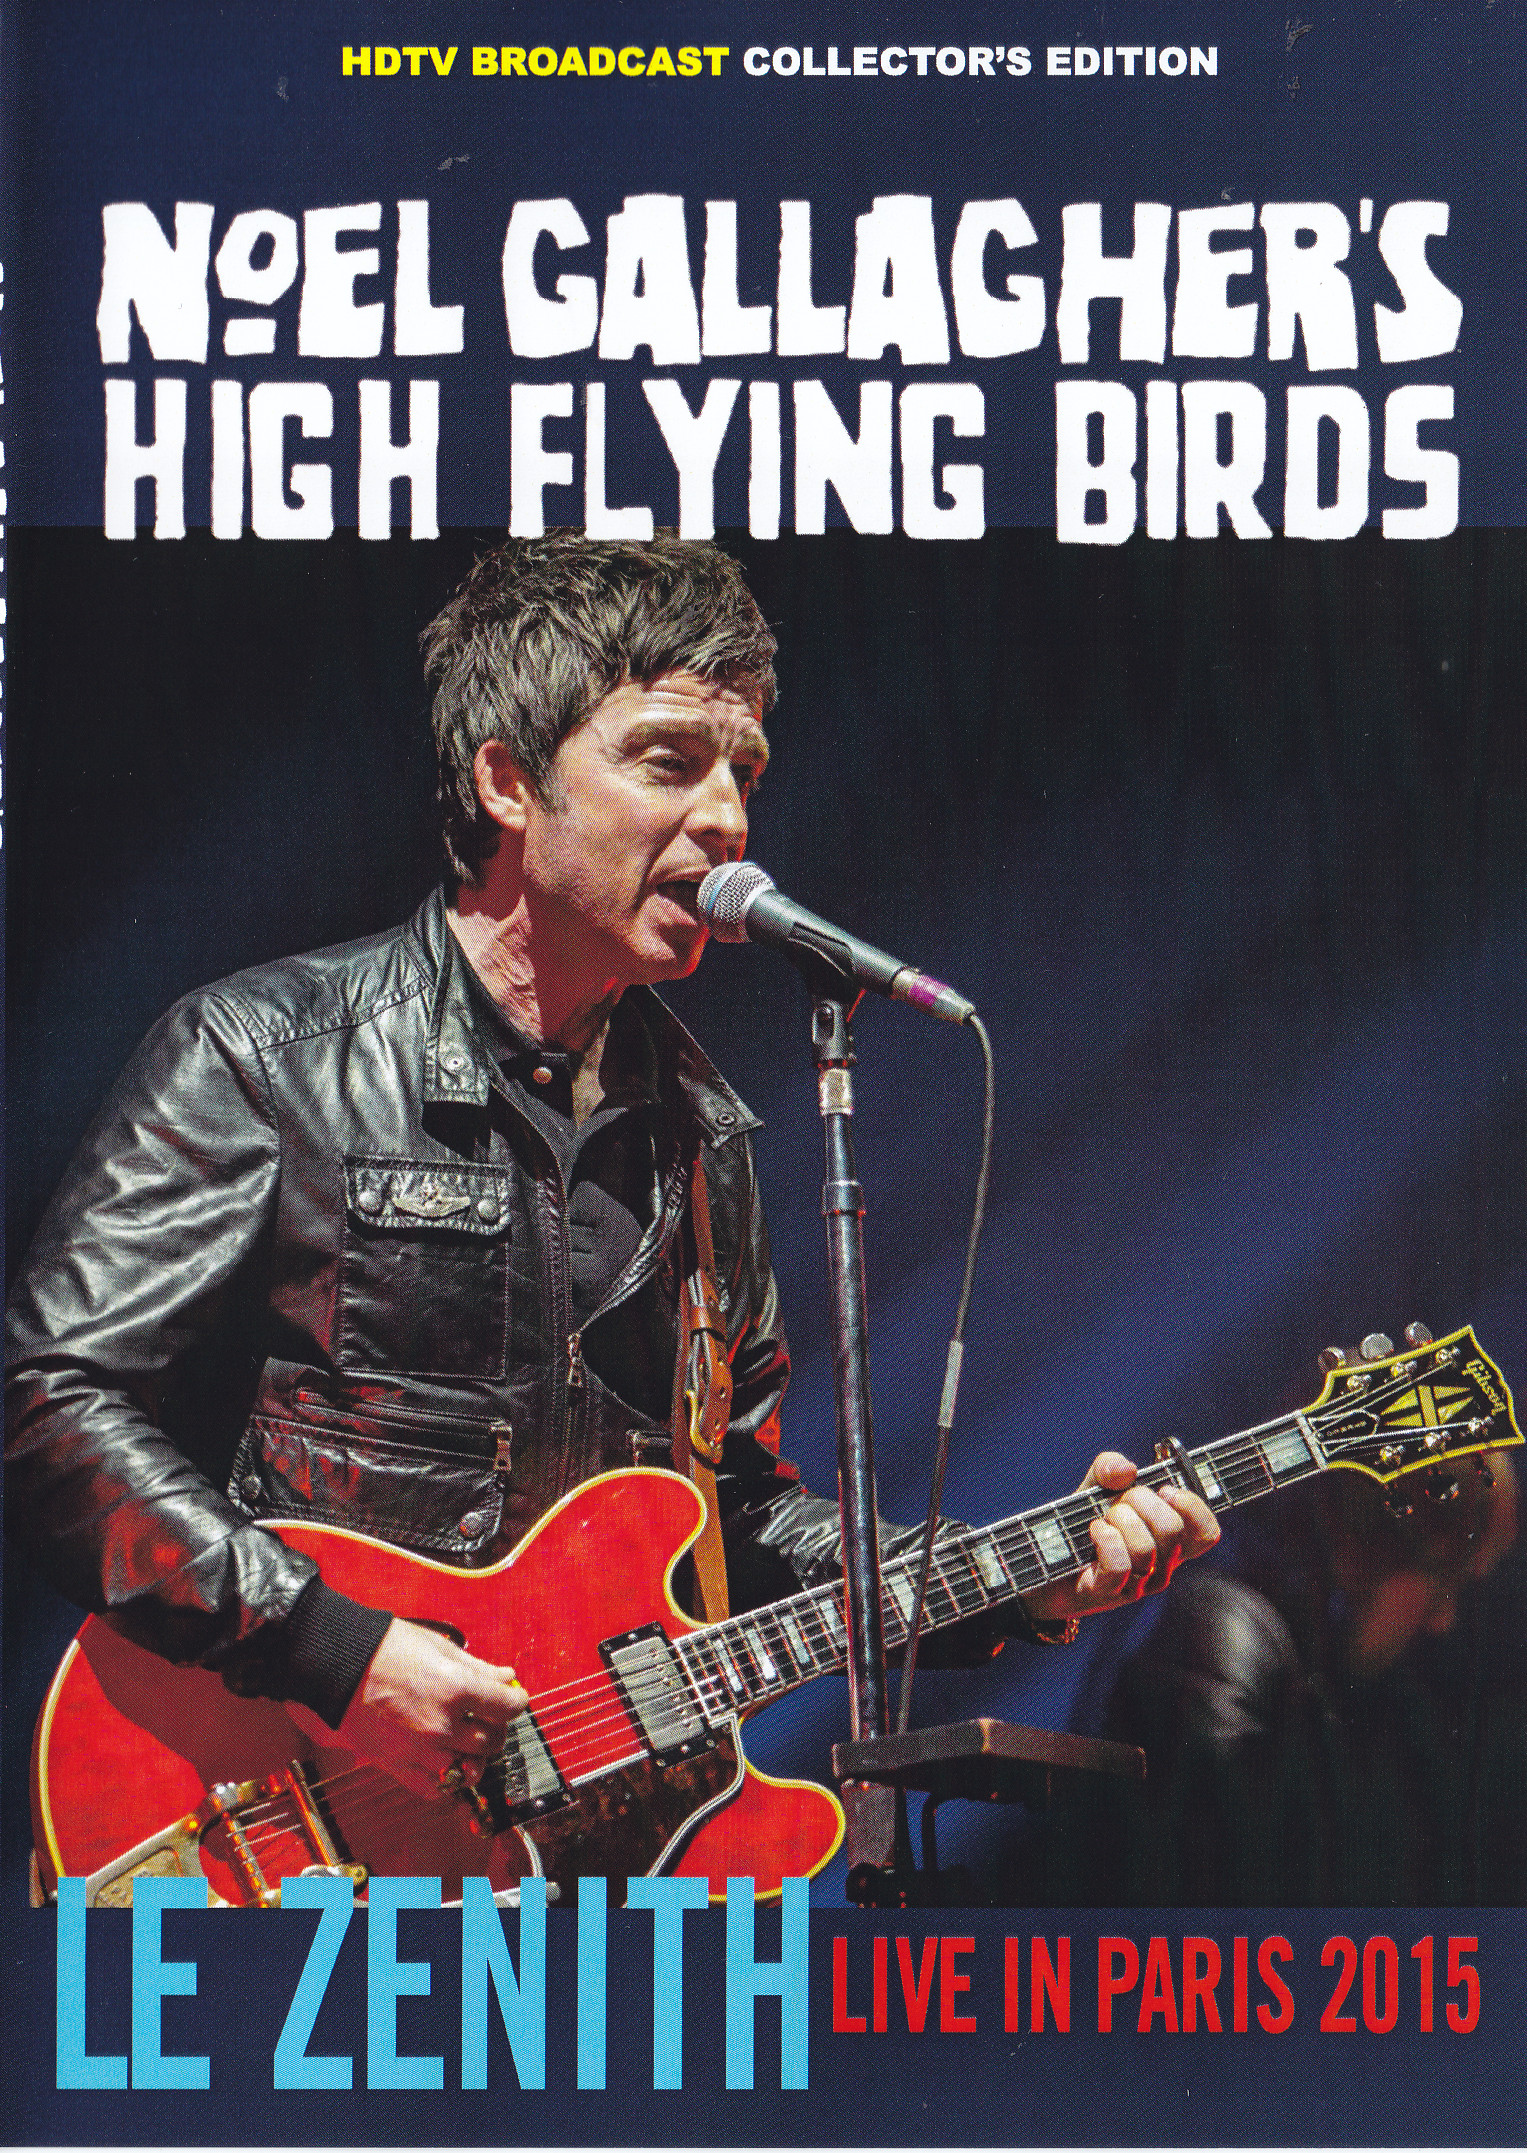 noel gallagher zenith paris 2018 Noel Gallaghers High Flying Birds / Le Zenith Live In Paris 2015  noel gallagher zenith paris 2018